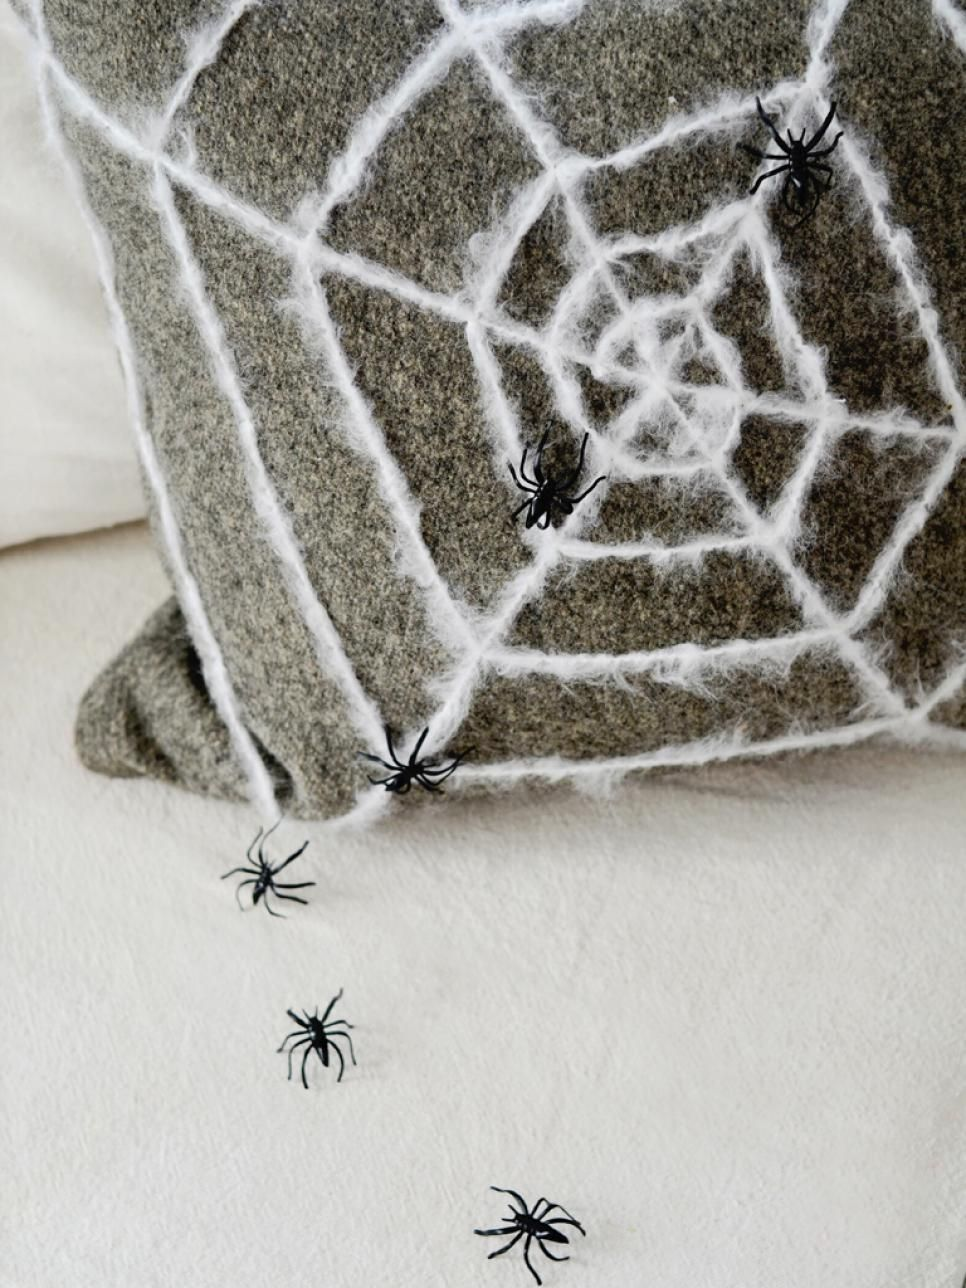 65+ DIY Halloween Decorations  Decorating Ideas Outdoor halloween - cute homemade halloween decorations